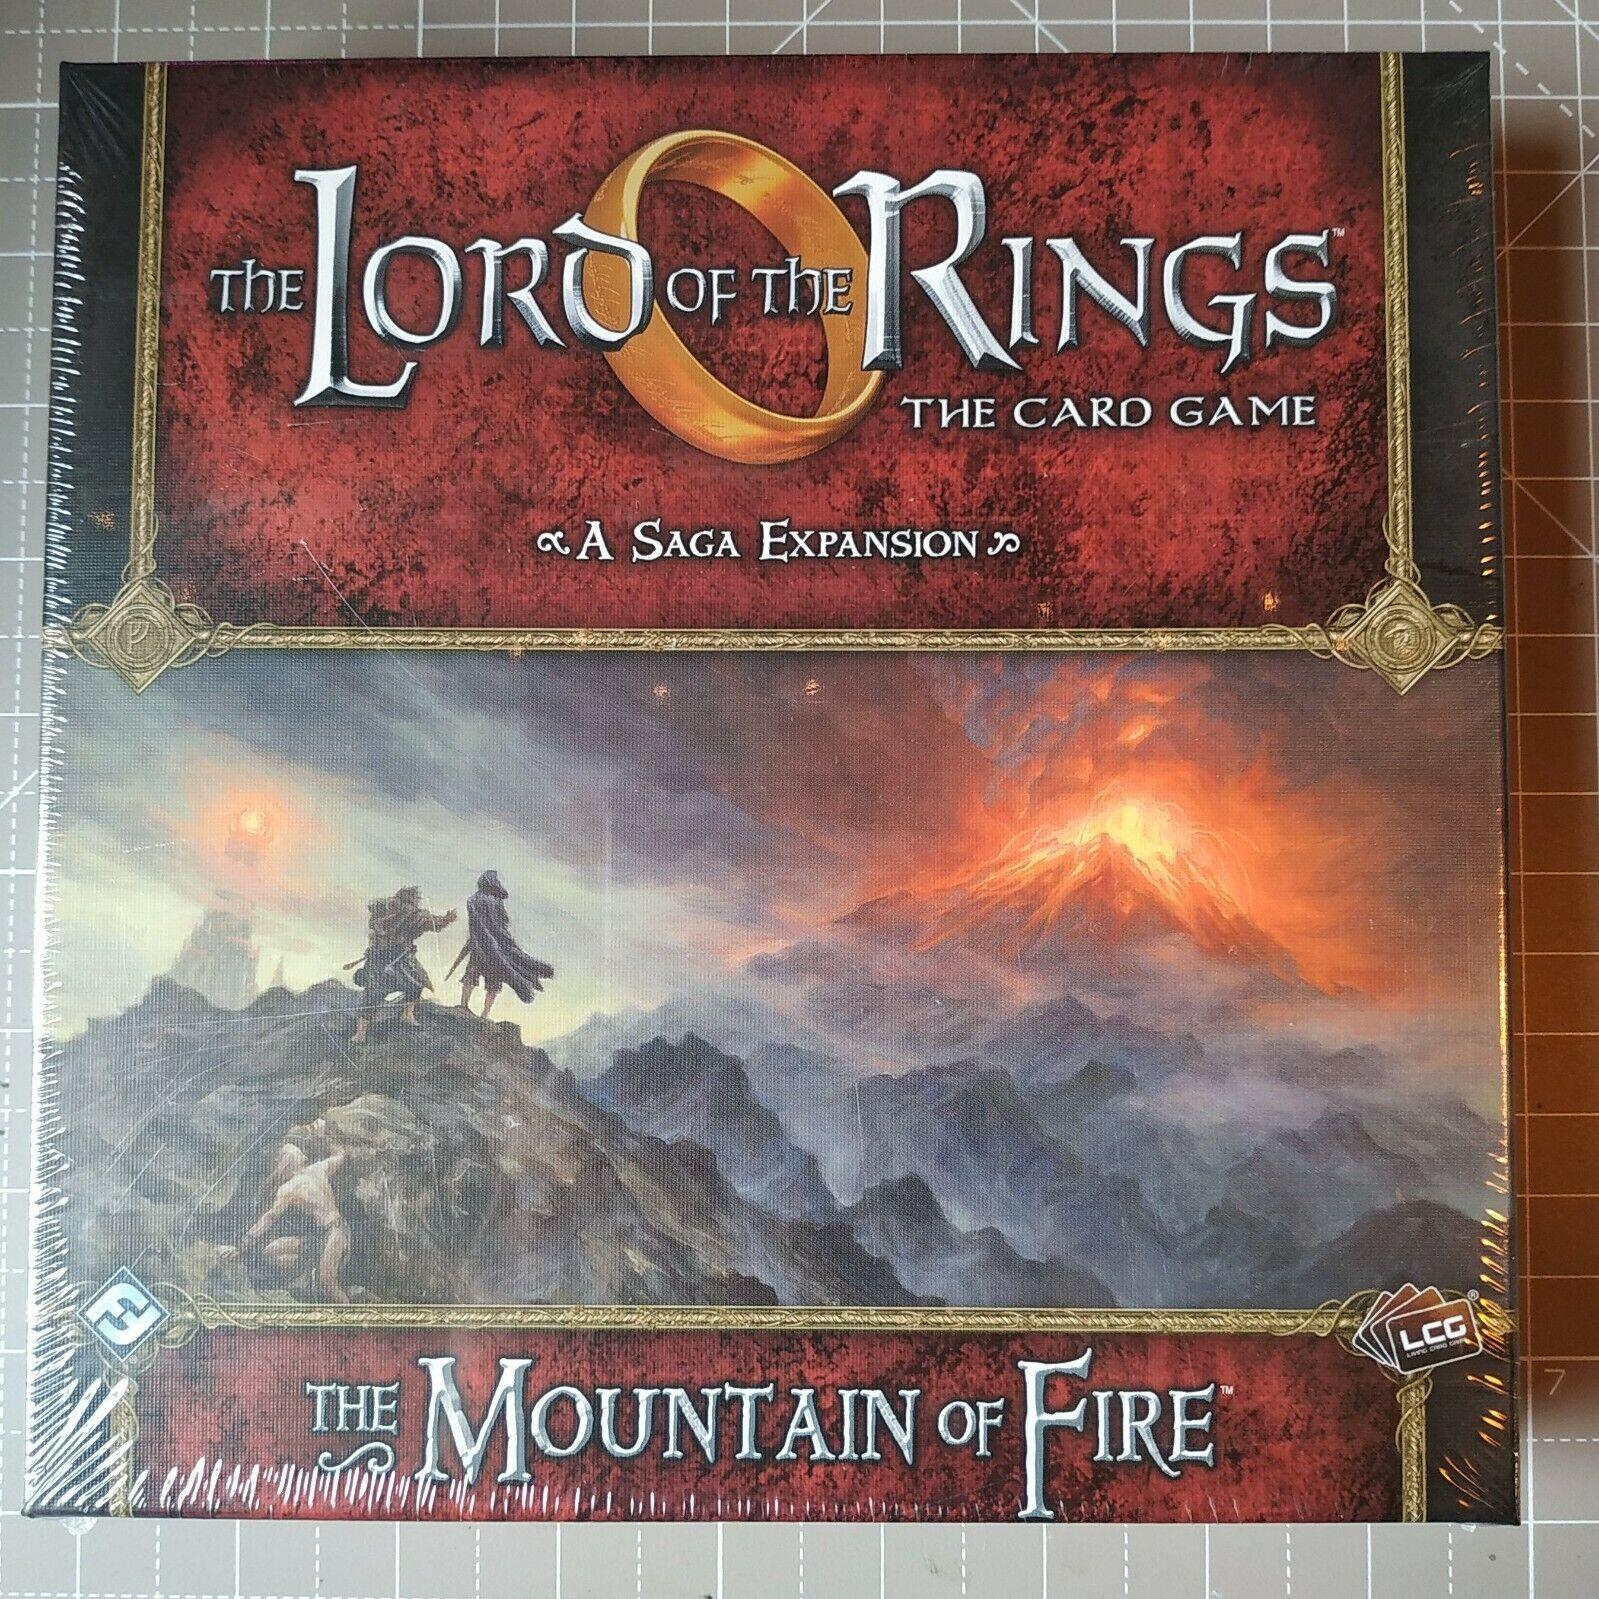 The Lord of the Rings  autod gioco LCG The Mountain of Fire Saga Expansion SEALED  grandi risparmi